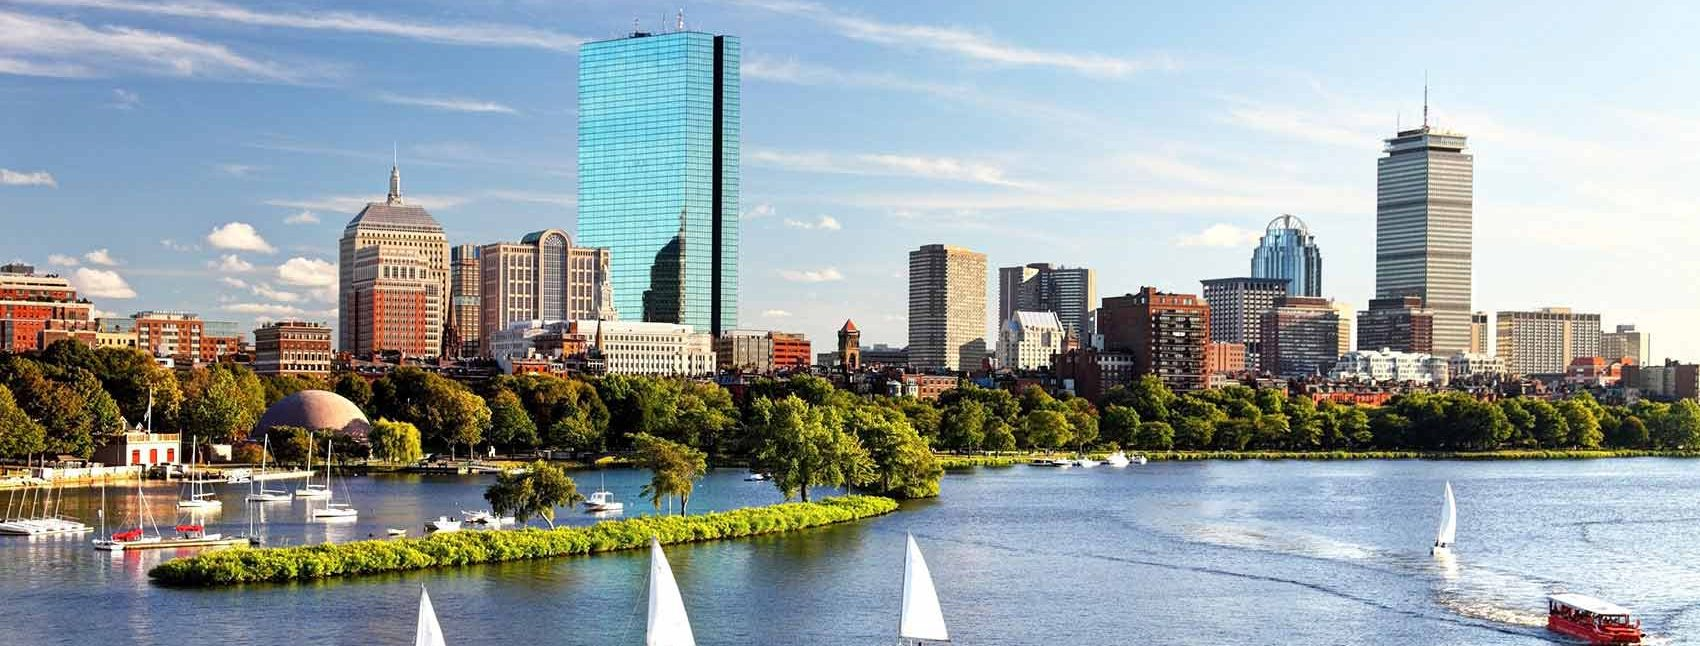 BostonH